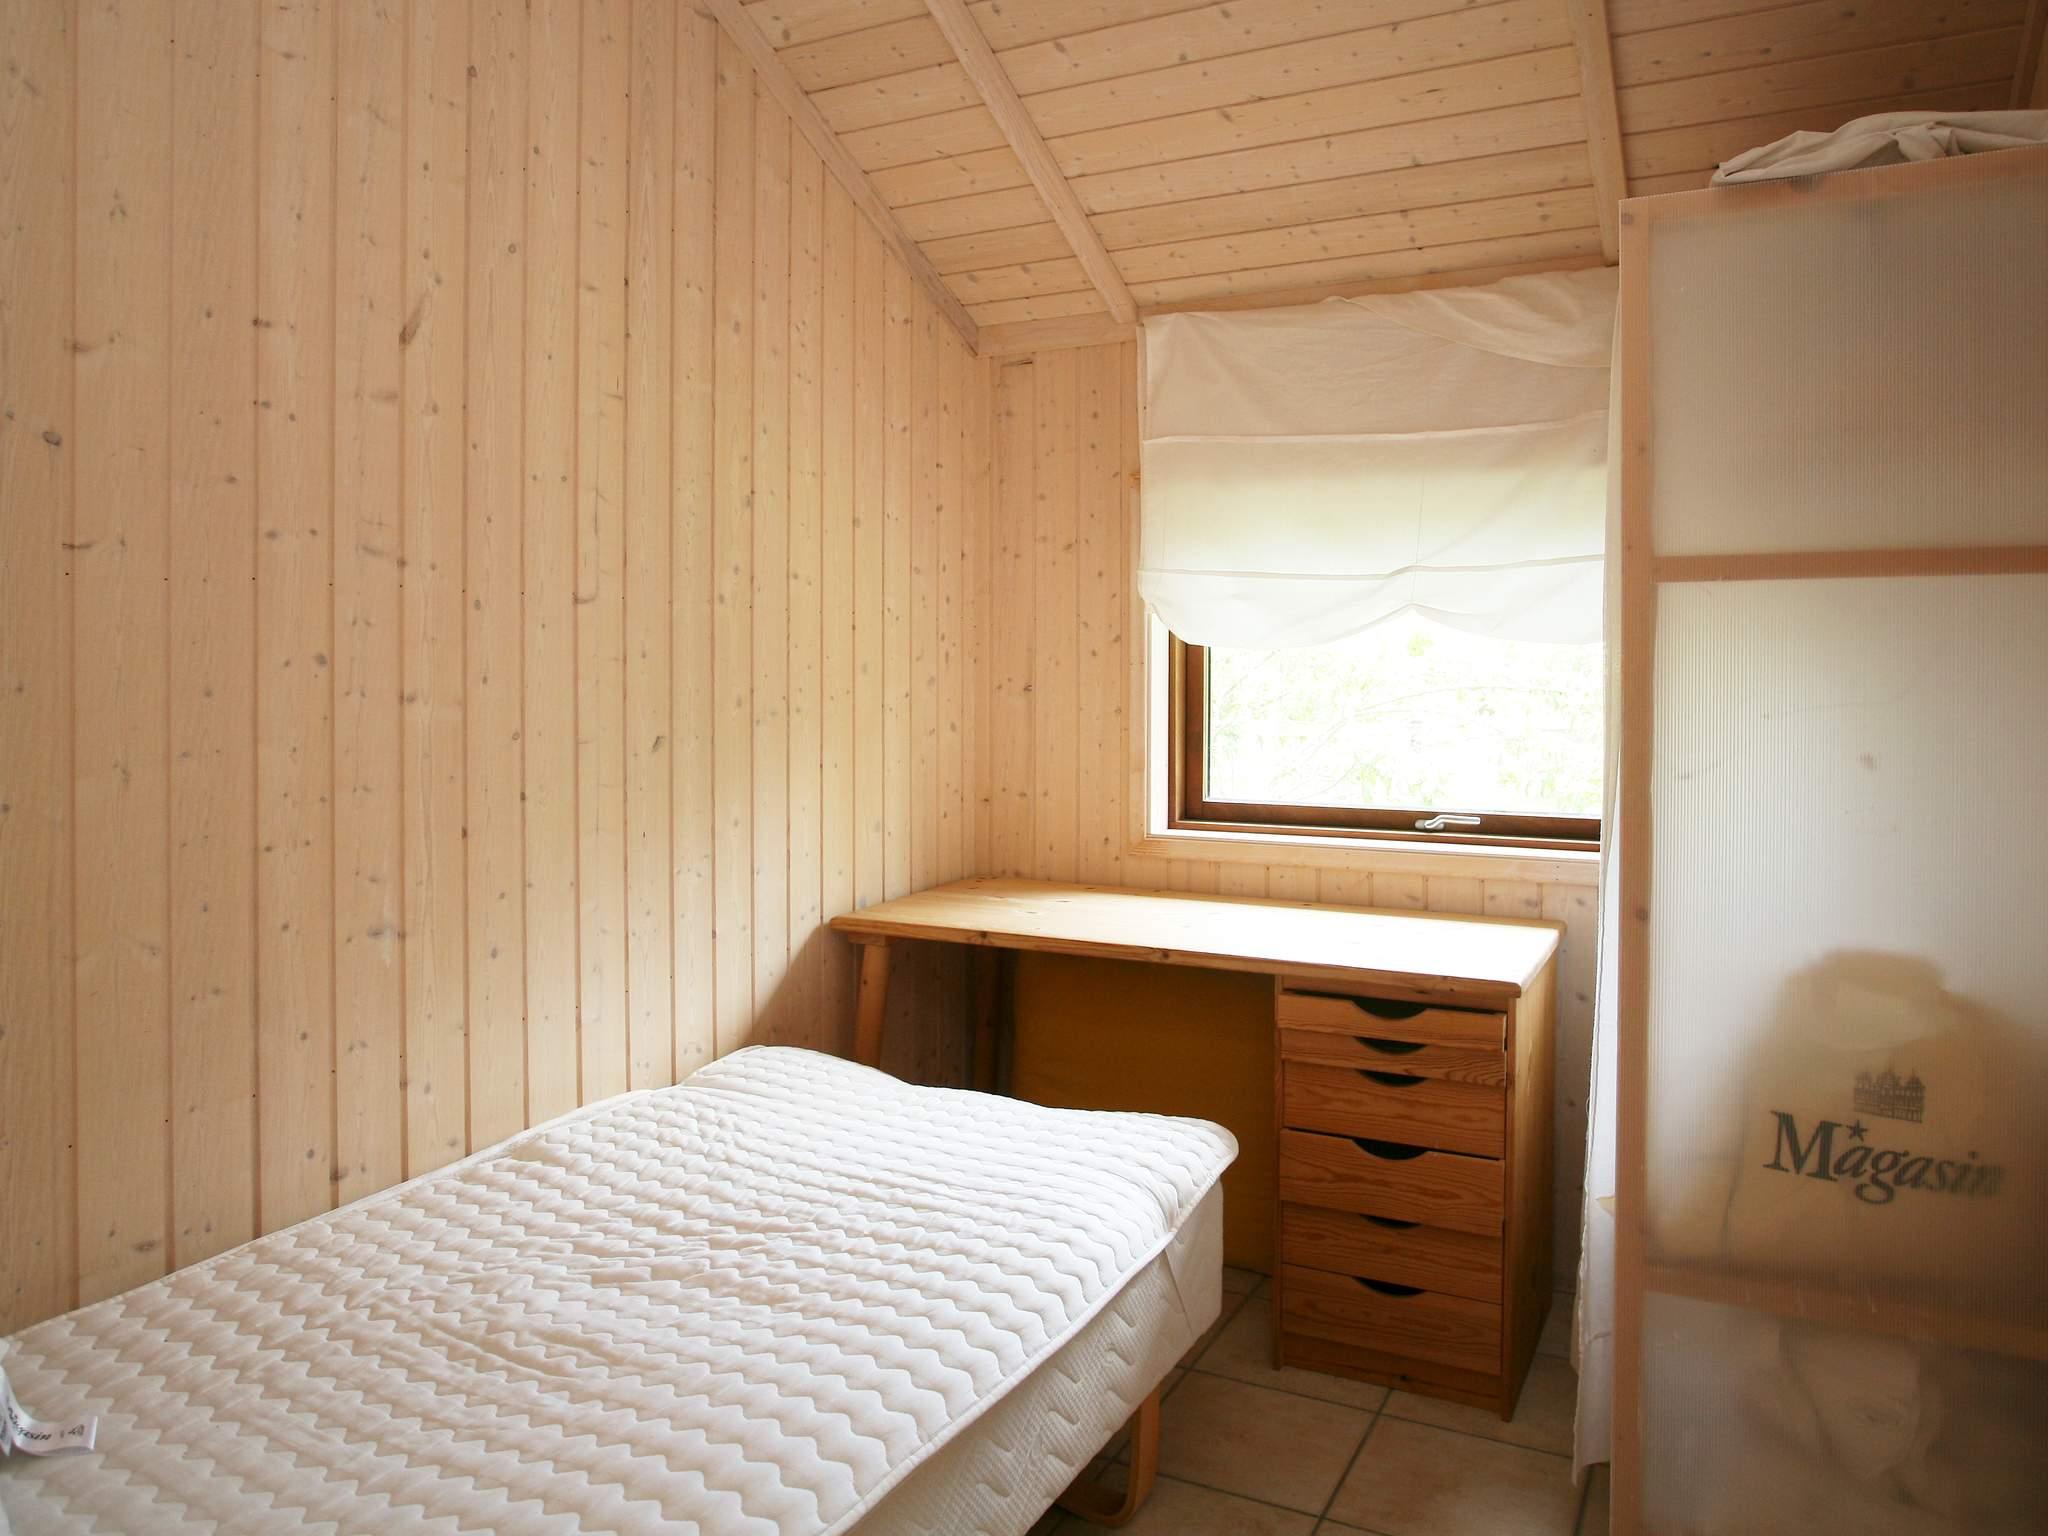 Ferienhaus Ore Strand (300650), Oreby, , Südseeland, Dänemark, Bild 9